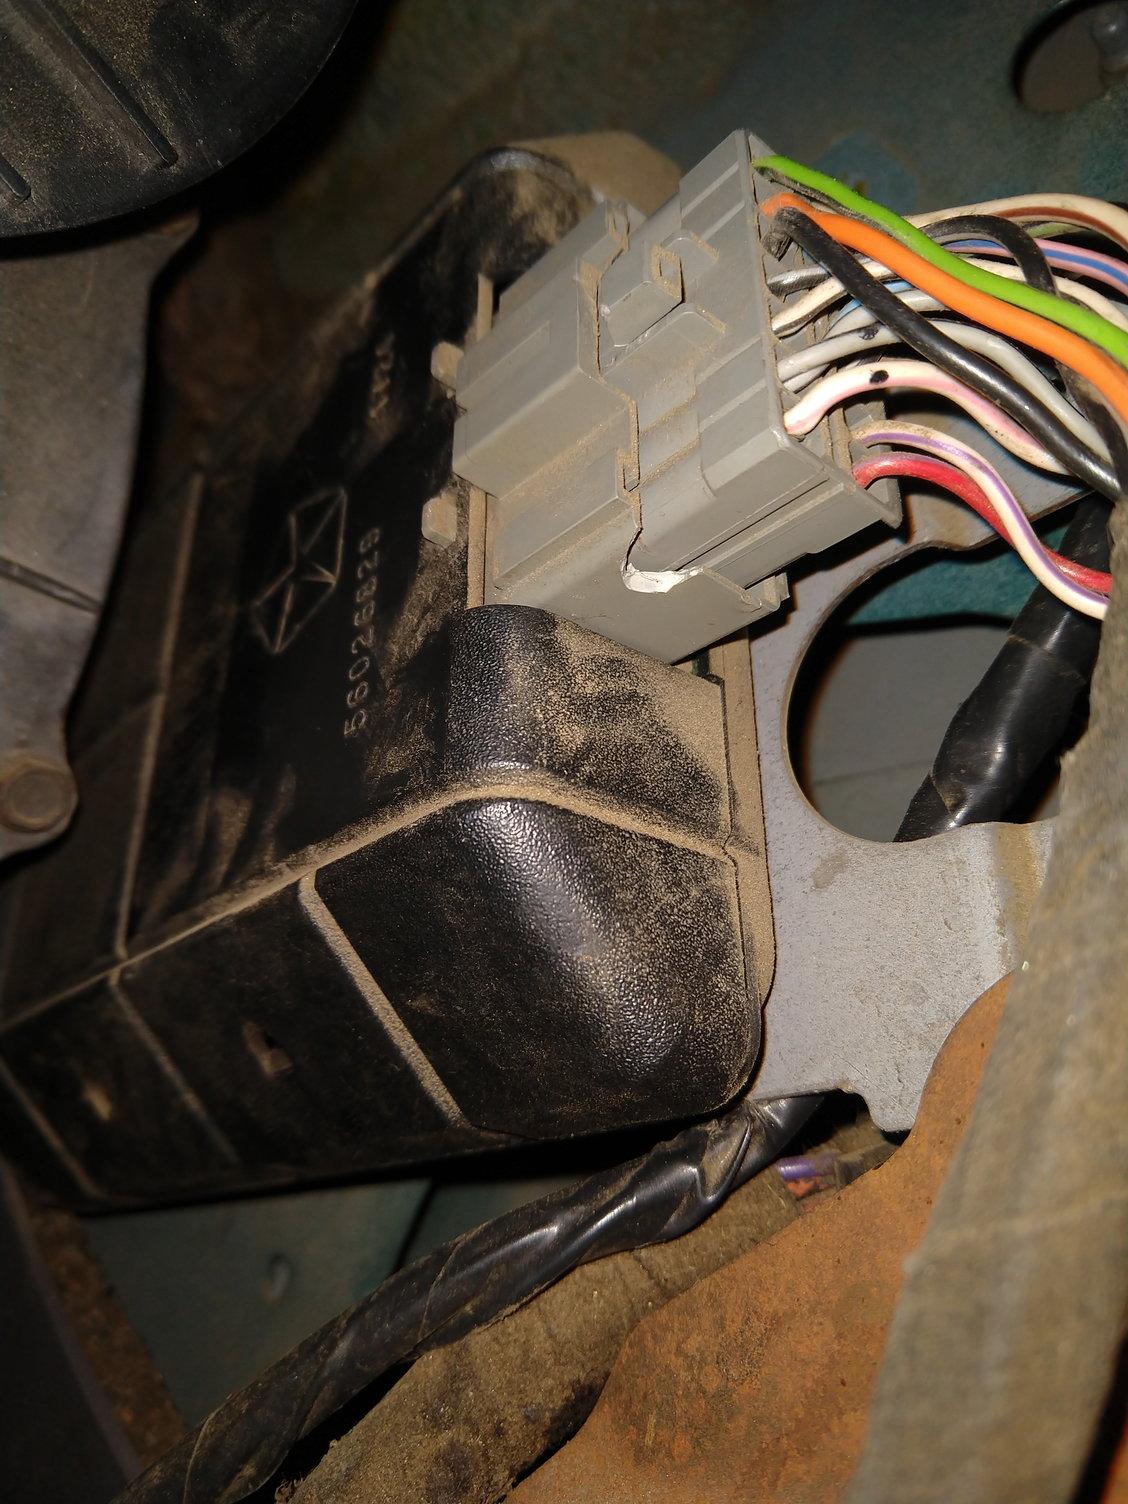 1994 dodge dakota wiring abs 56026829 1994 dodge dakota 2wd dodgeforum com  abs 56026829 1994 dodge dakota 2wd